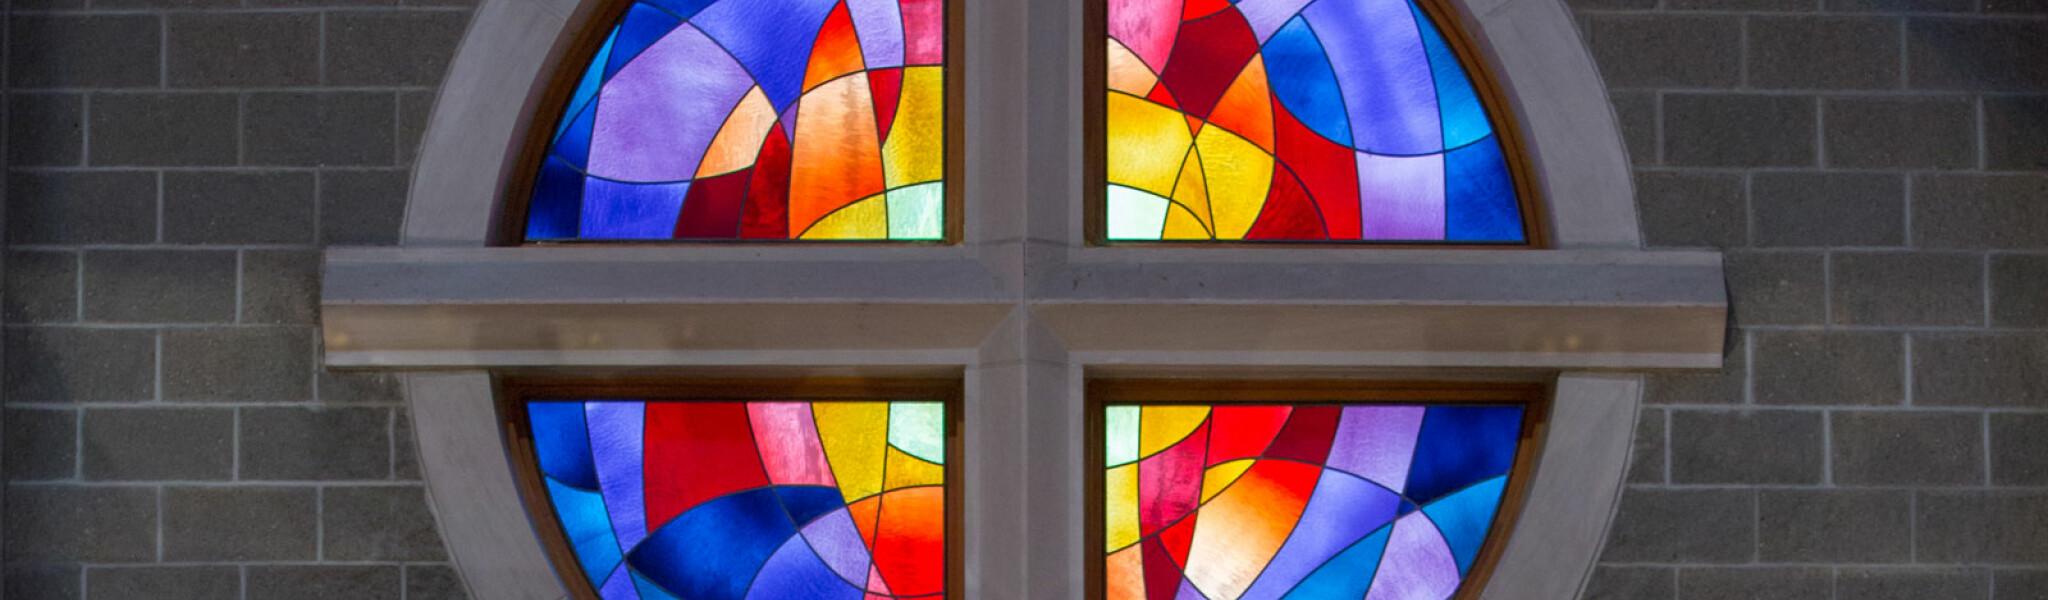 MOPS | Cornerstone Lutheran Church | Cornerstone Lutheran Church